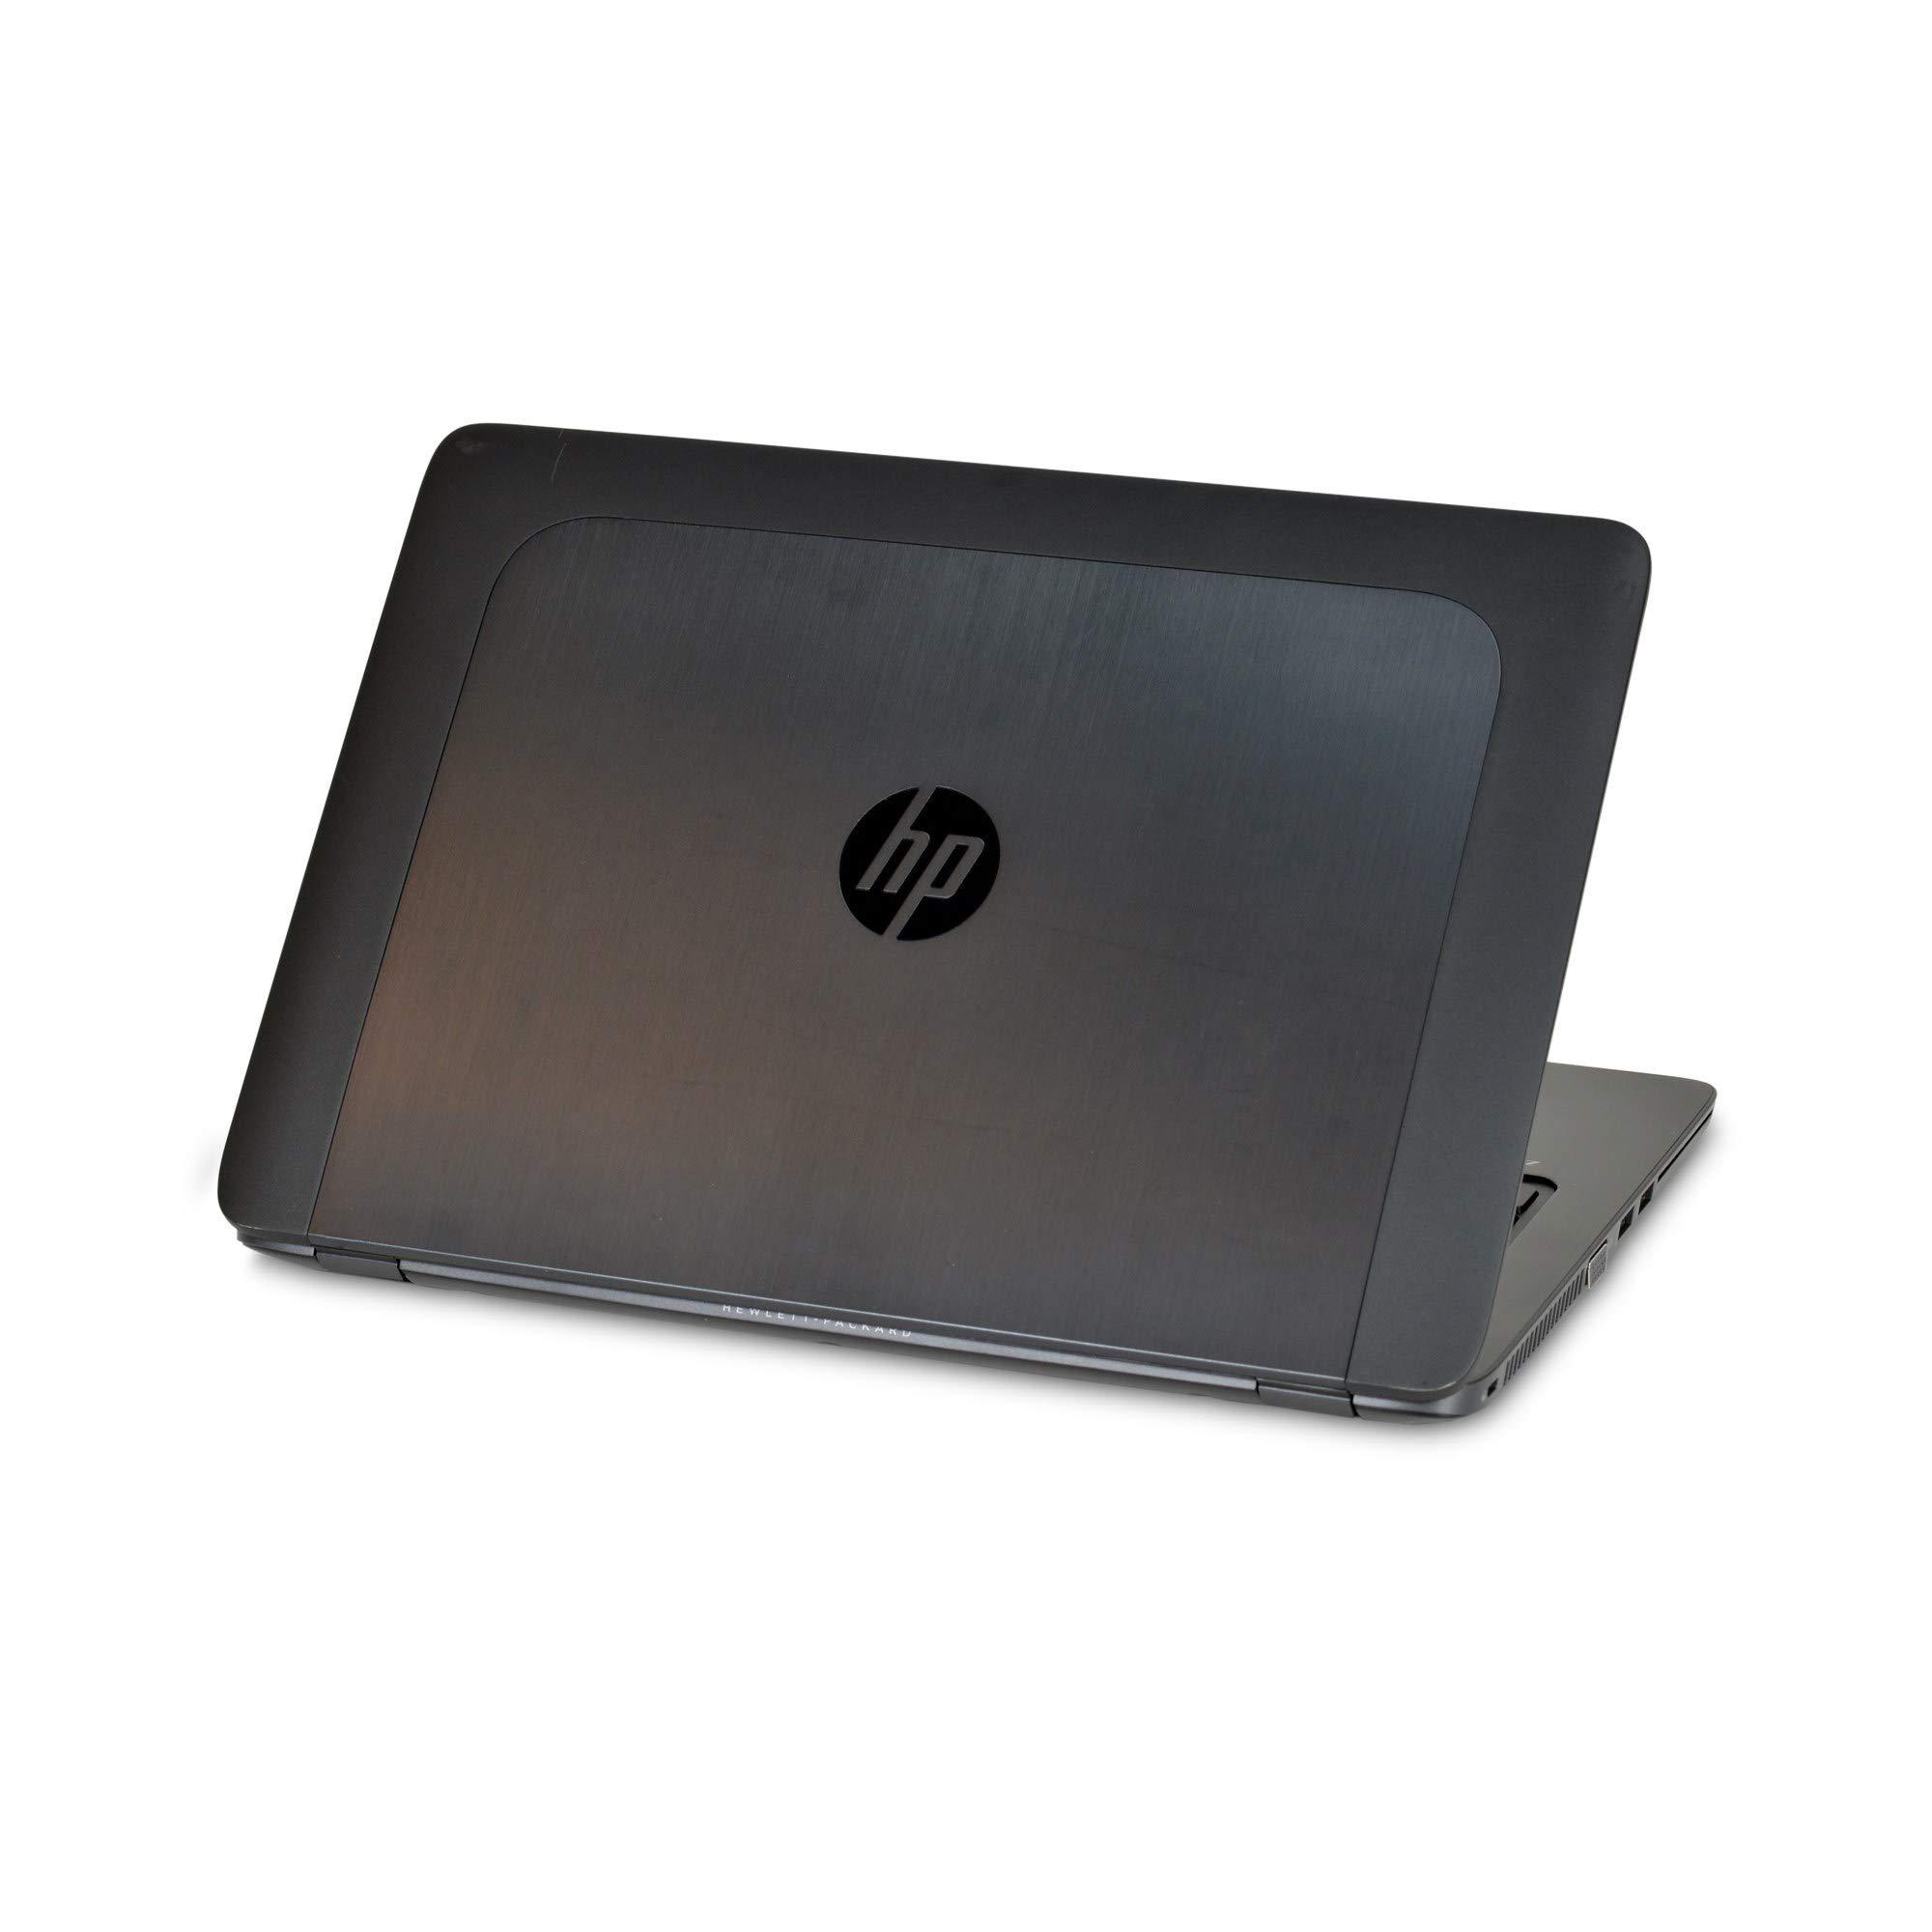 "HP ZBook 14 G2 14"" Laptop, Core i5-5200U 2.2GHz, 16GB Ram, 512 SSD, 1600x900, Bluetooth, Windows 10 Pro 64bit, Backlit Keyboard, Webcam (Renewed)"